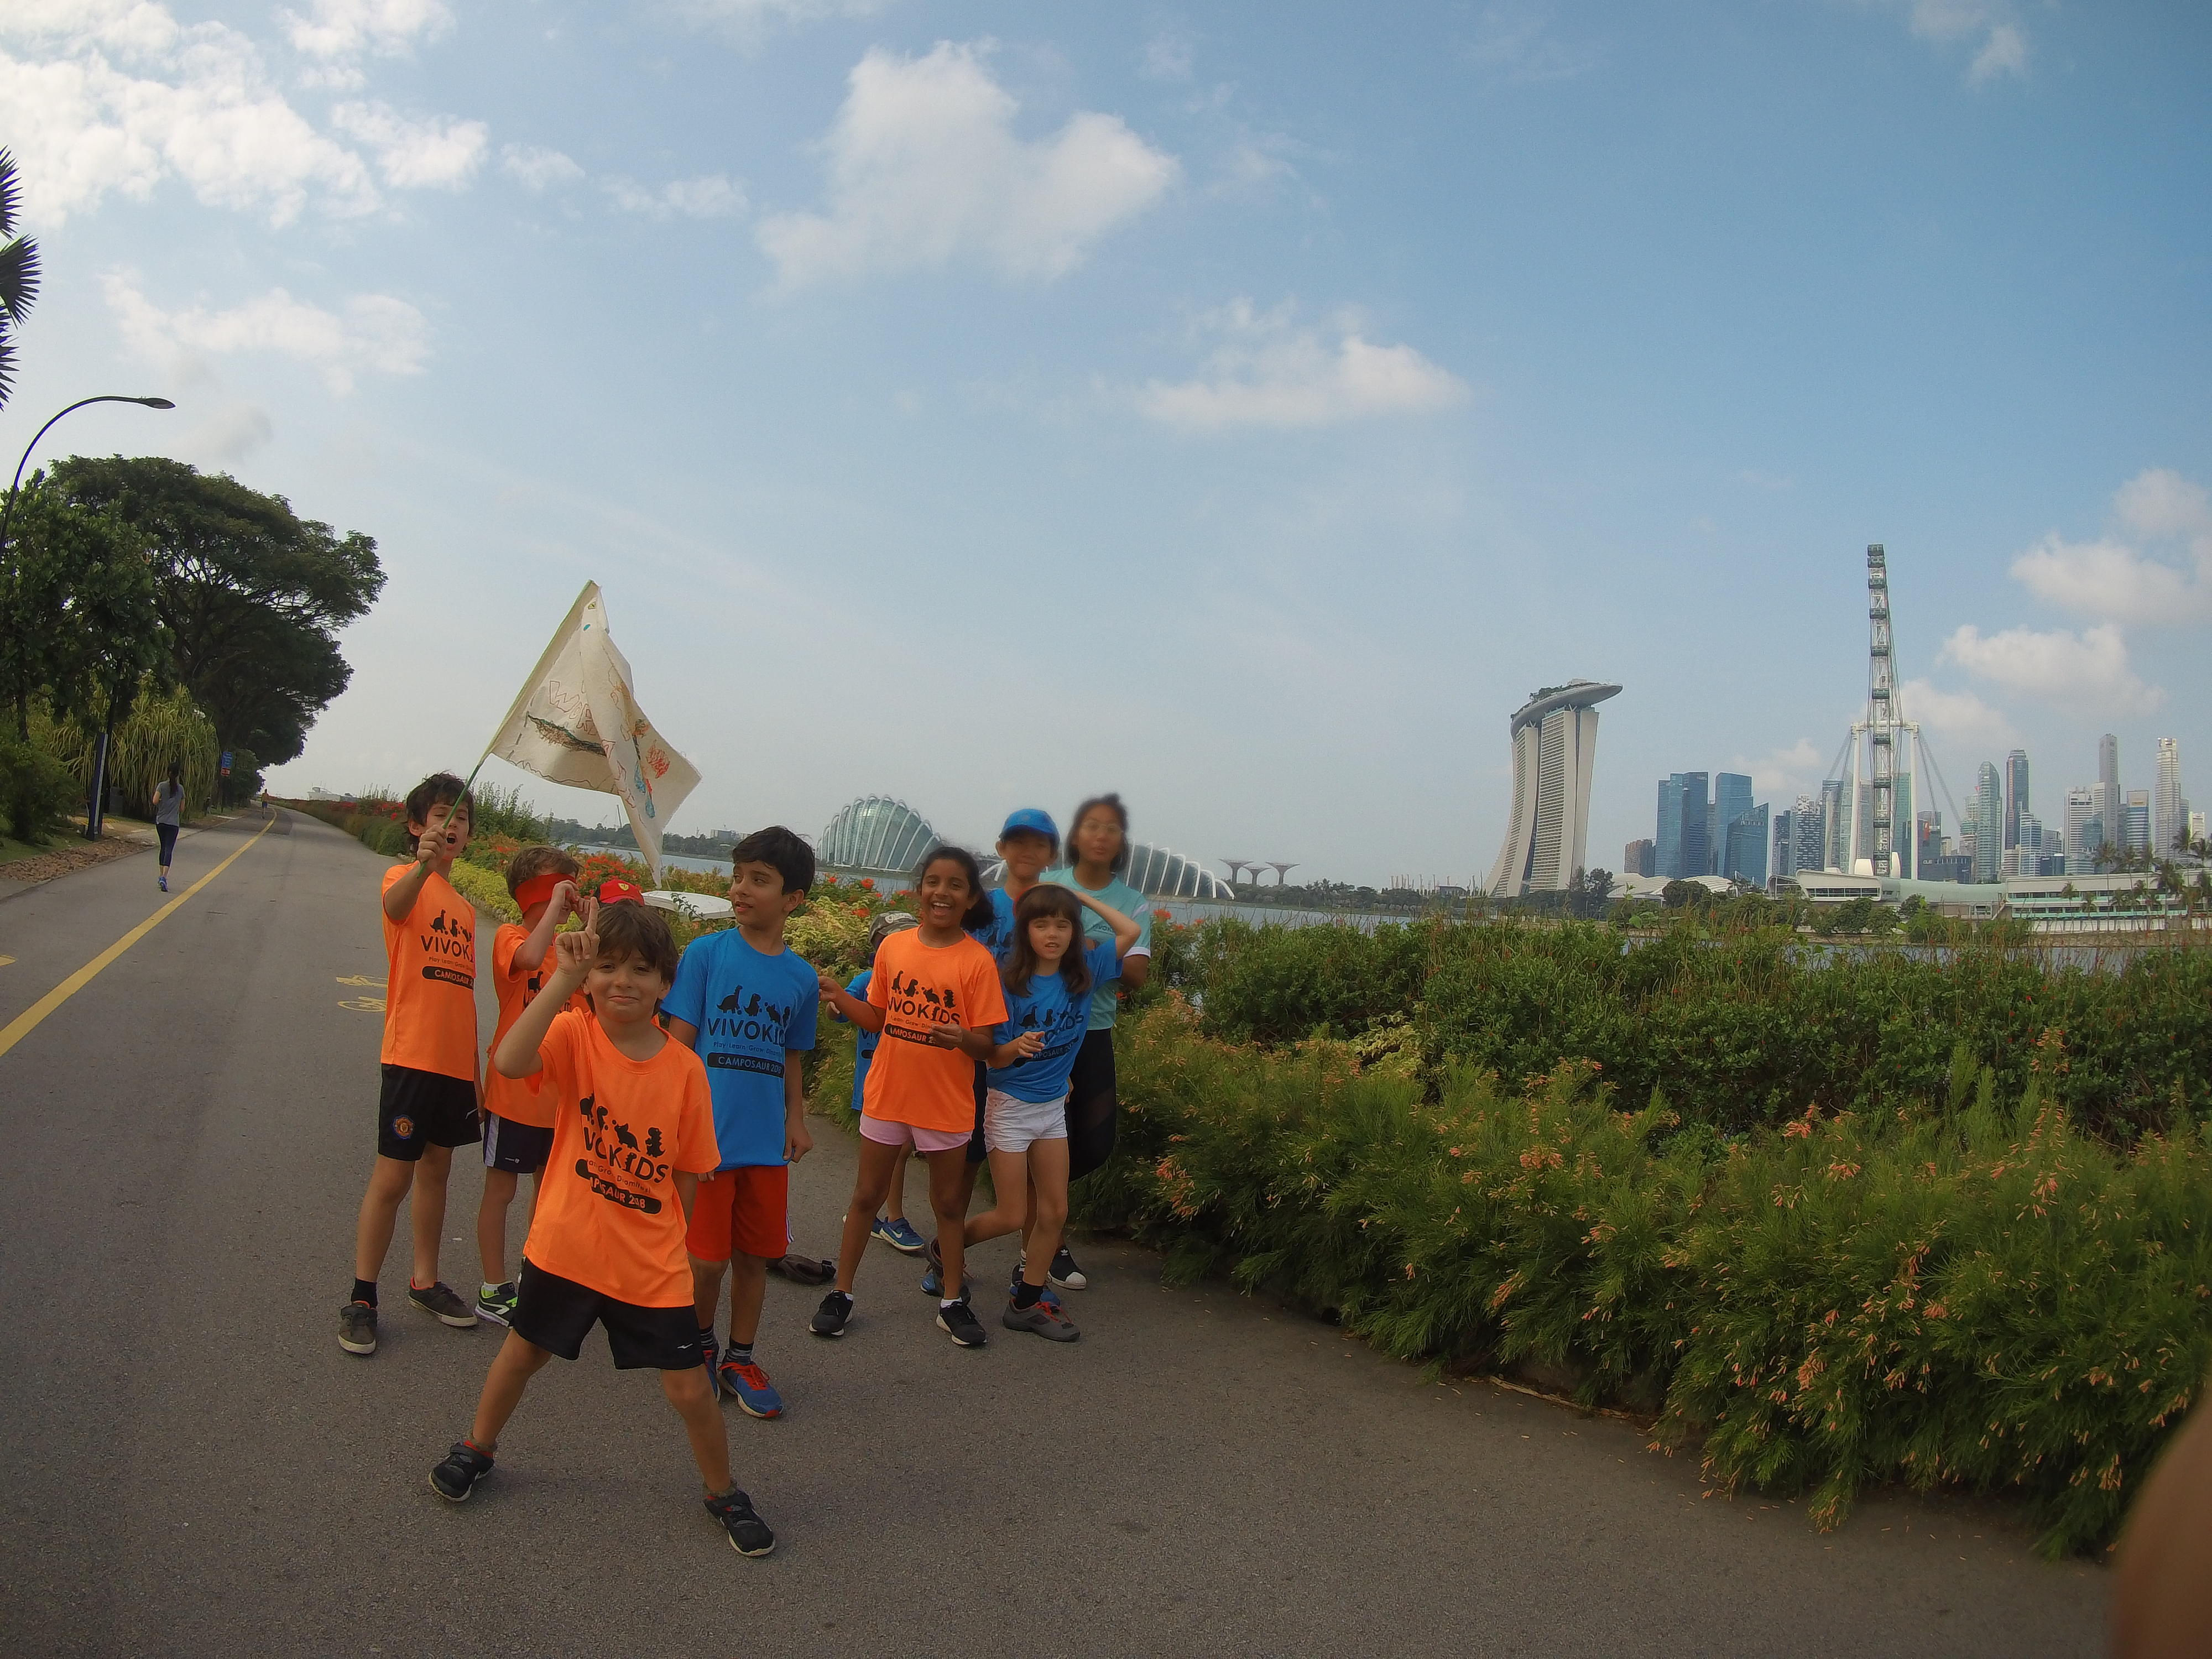 Vivo Kids Summer Camp